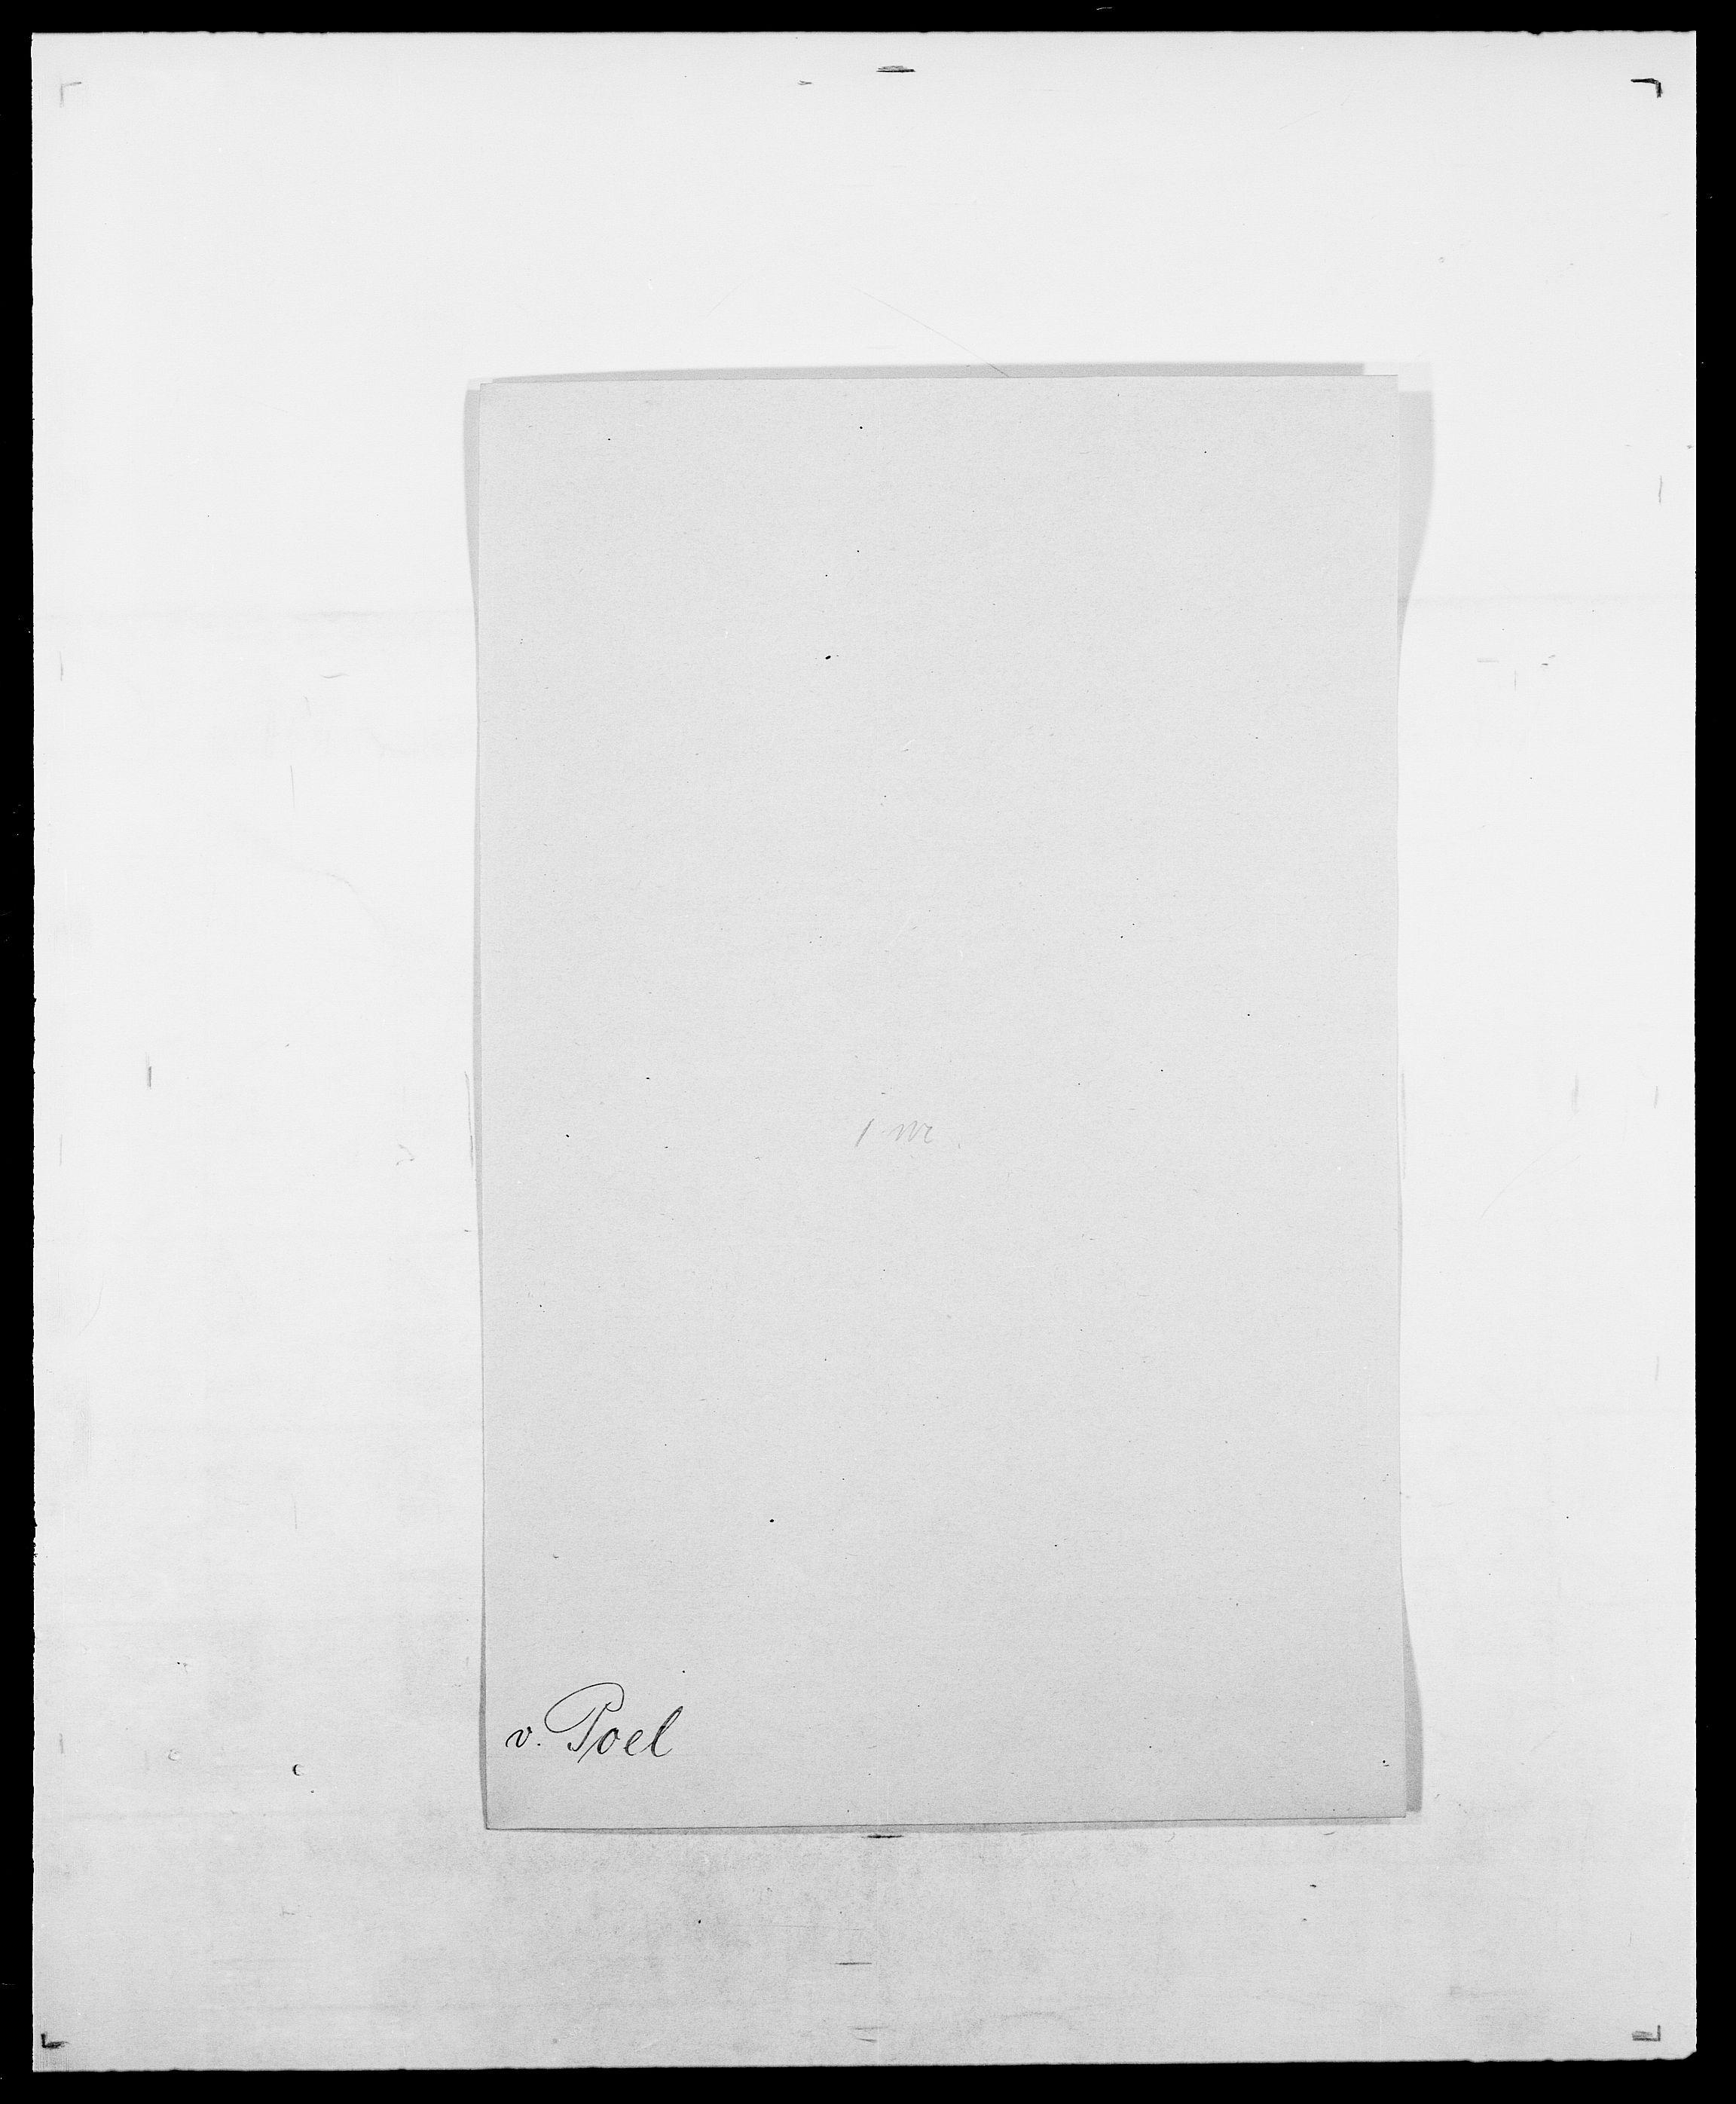 SAO, Delgobe, Charles Antoine - samling, D/Da/L0031: de Place - Raaum, s. 158